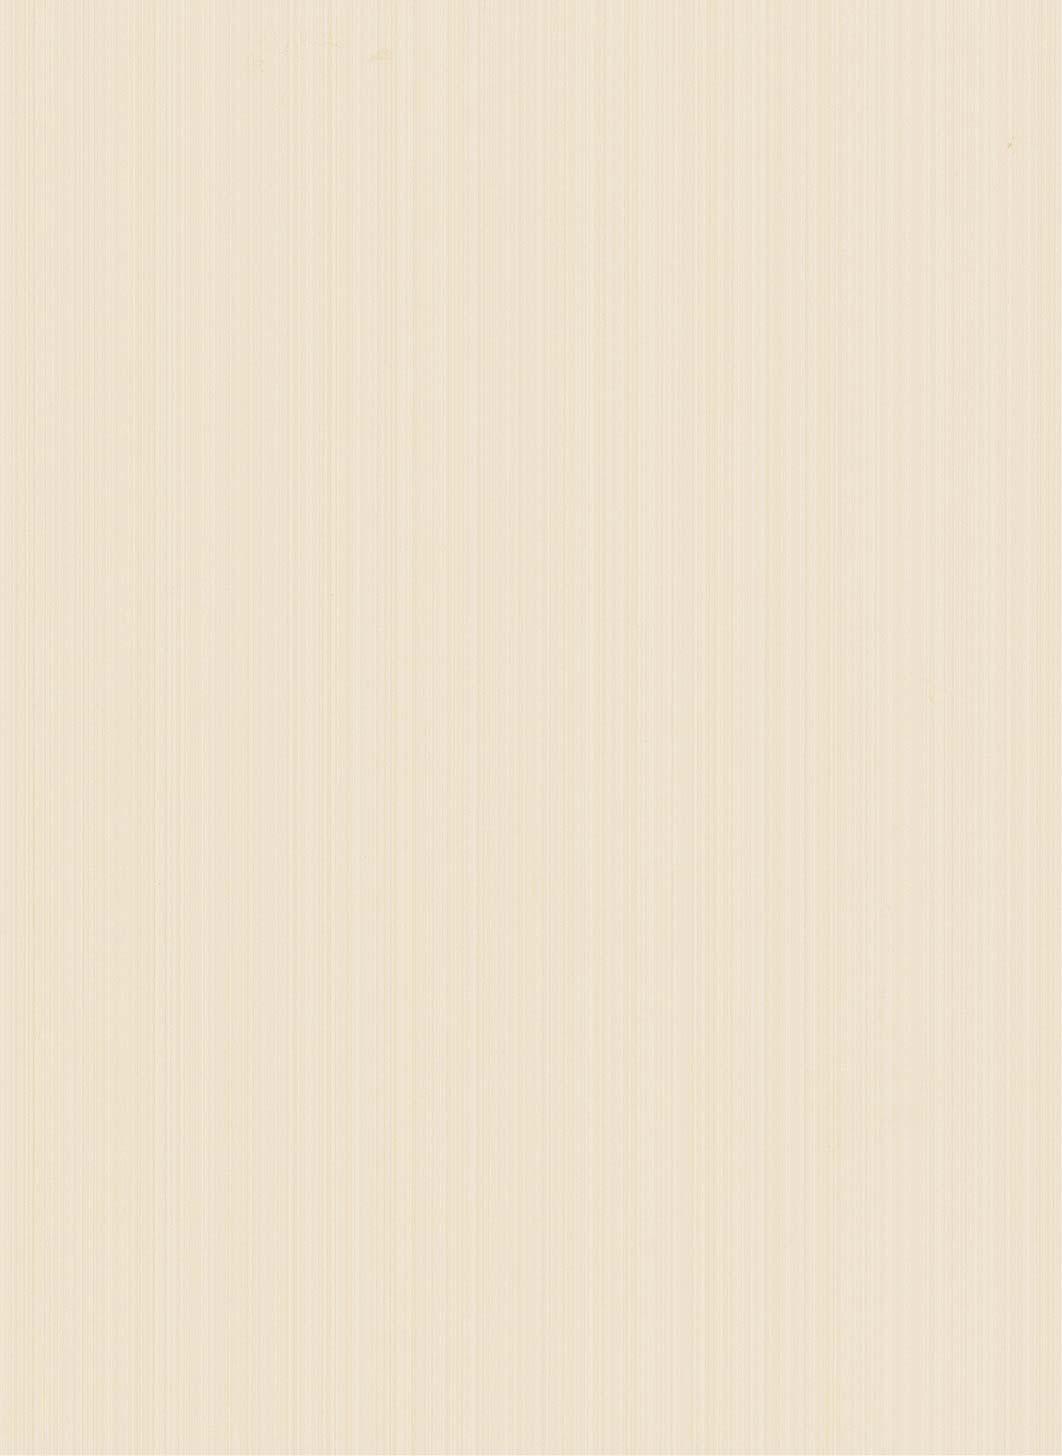 Английские обои Cole & Son,  коллекция Festival Stripes, артикул96/10054